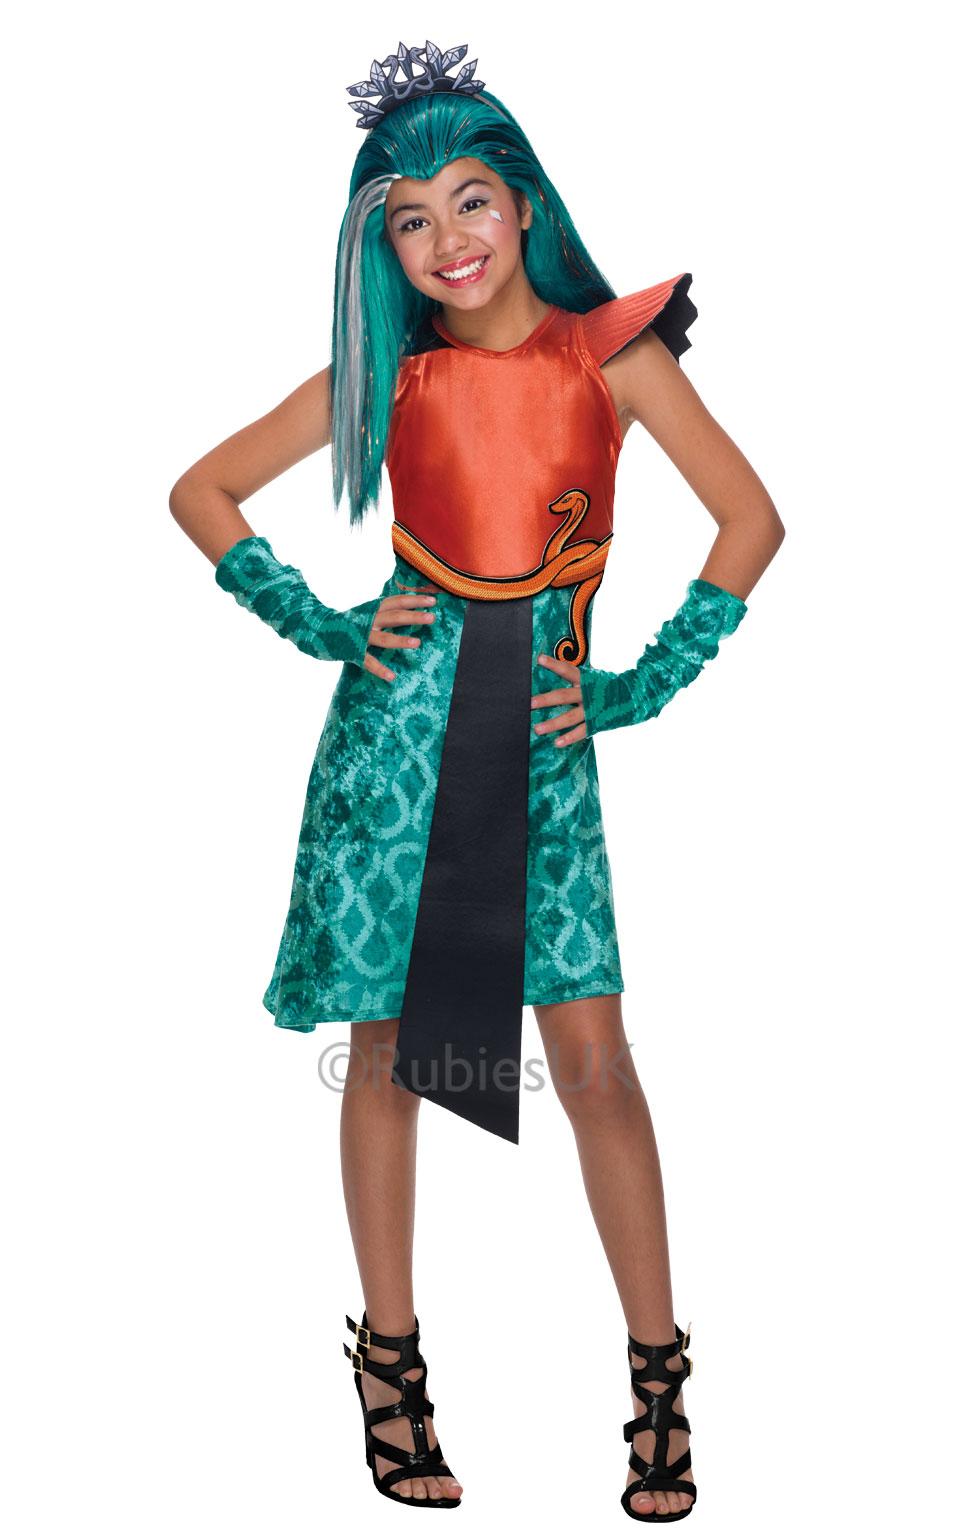 girls halloween monster high nefera de nile costume kids fancy dress outfit. Black Bedroom Furniture Sets. Home Design Ideas